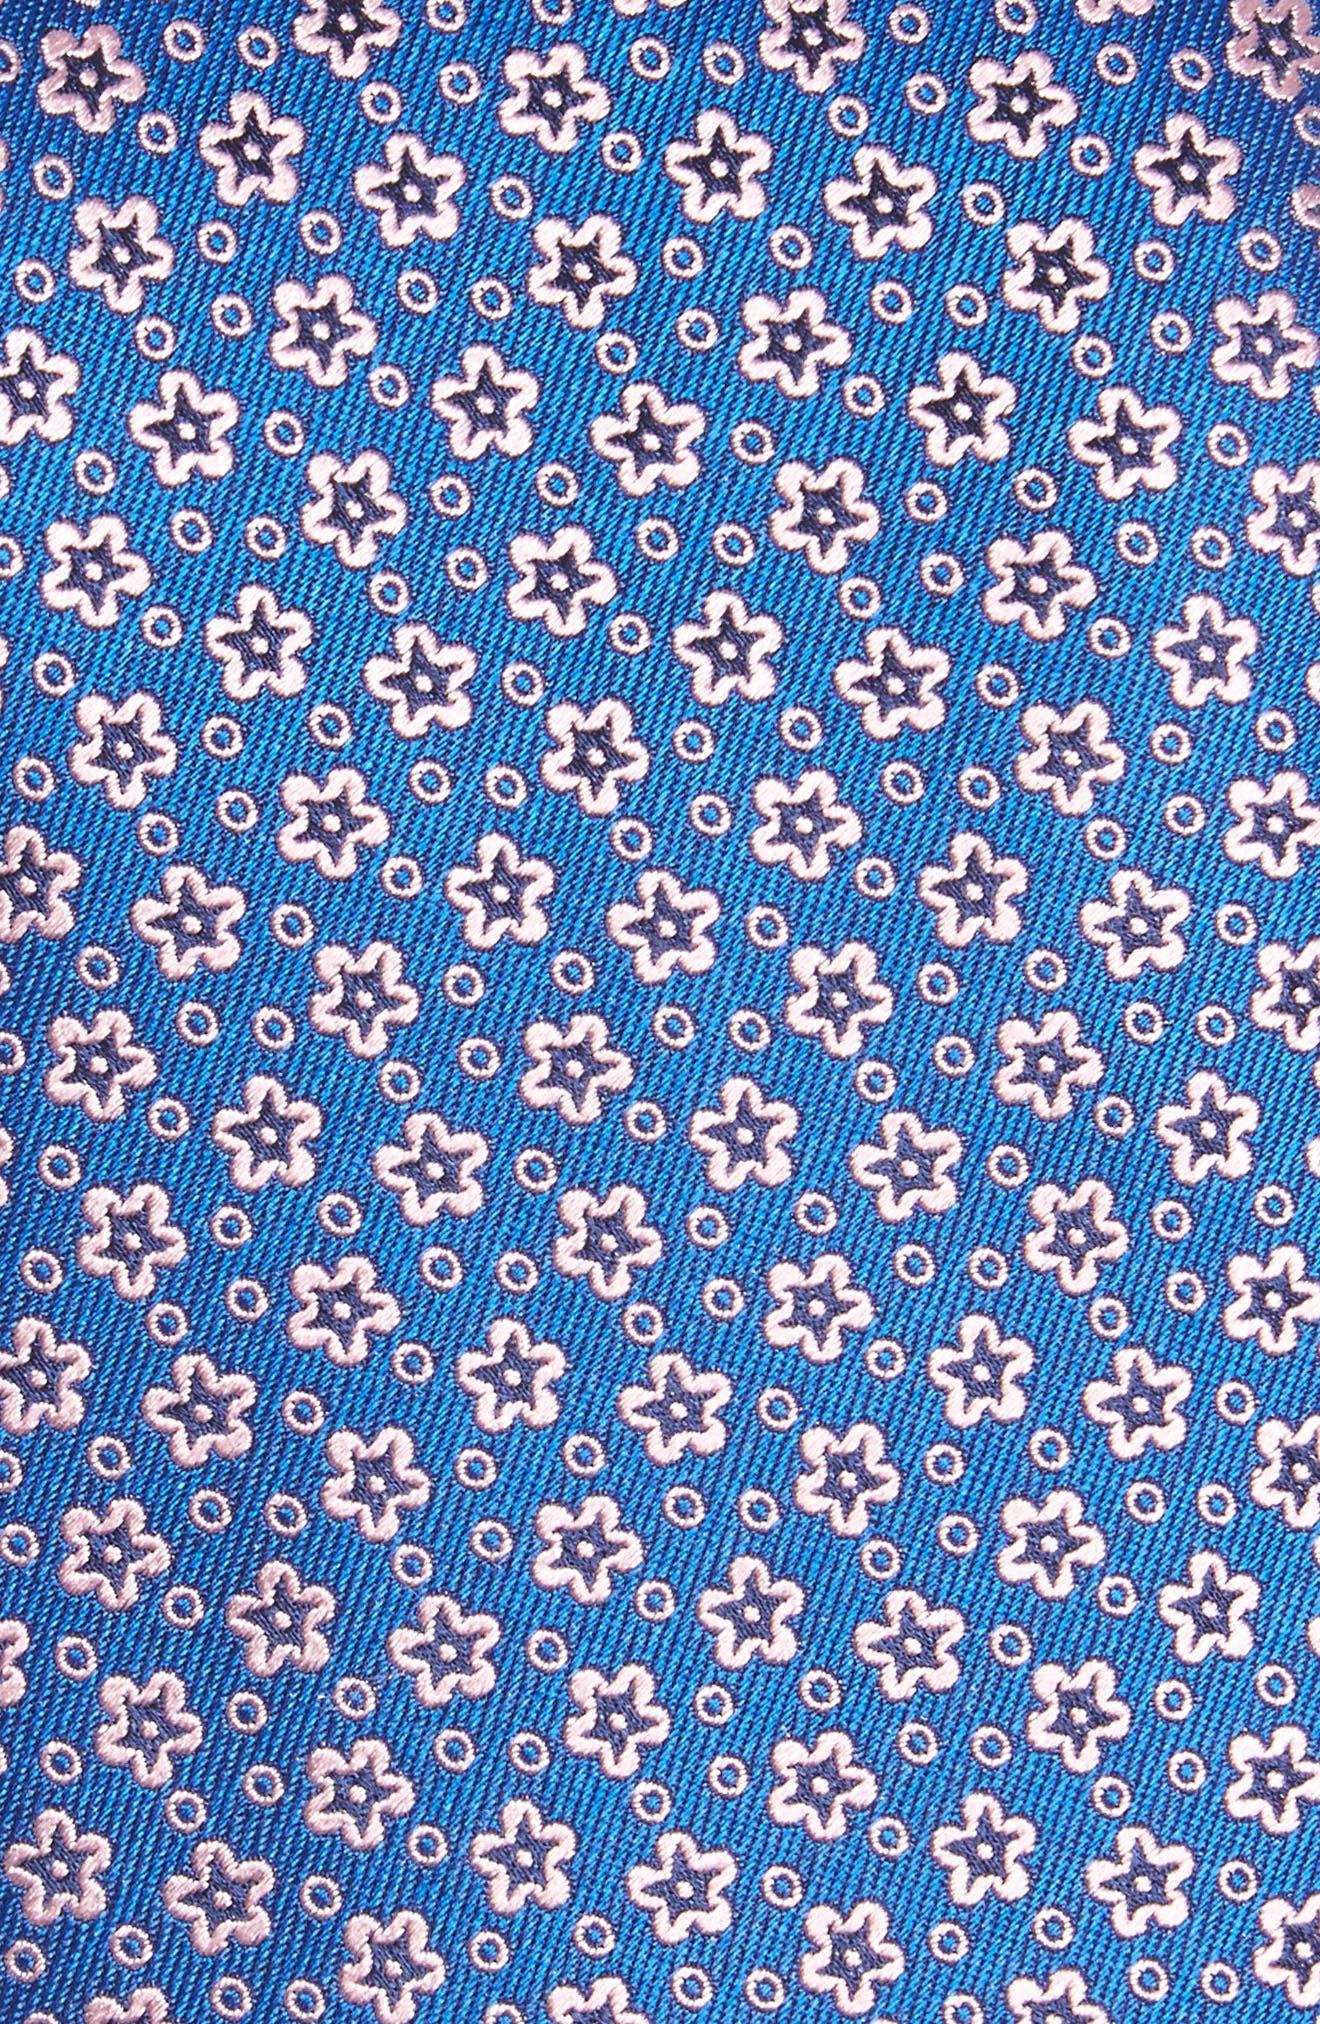 Floral Silk Tie,                             Alternate thumbnail 2, color,                             400